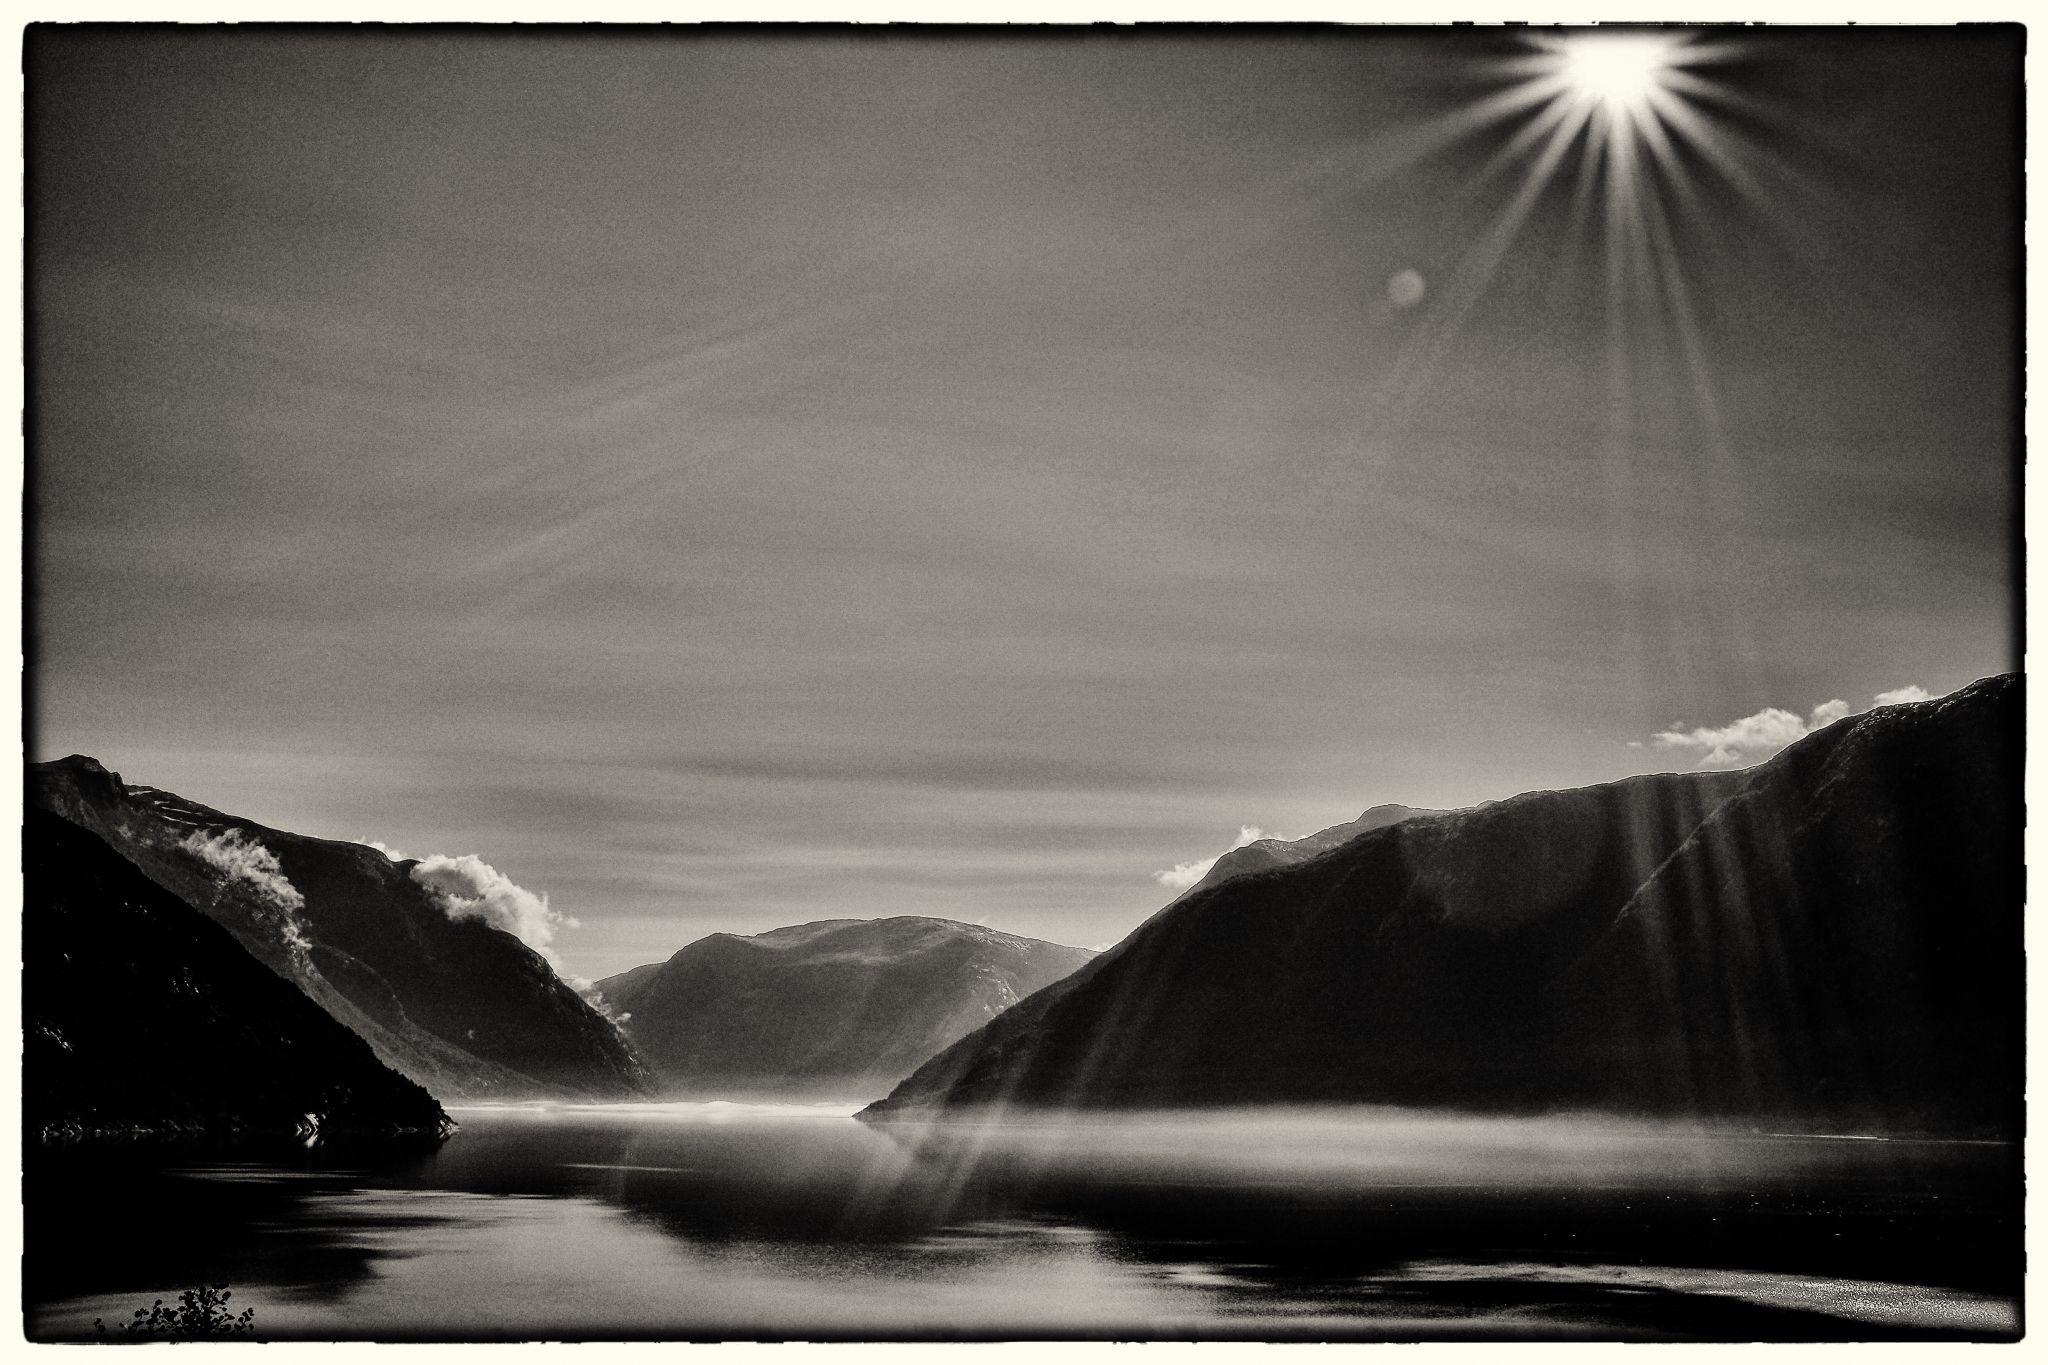 just before Ulvik, Norway